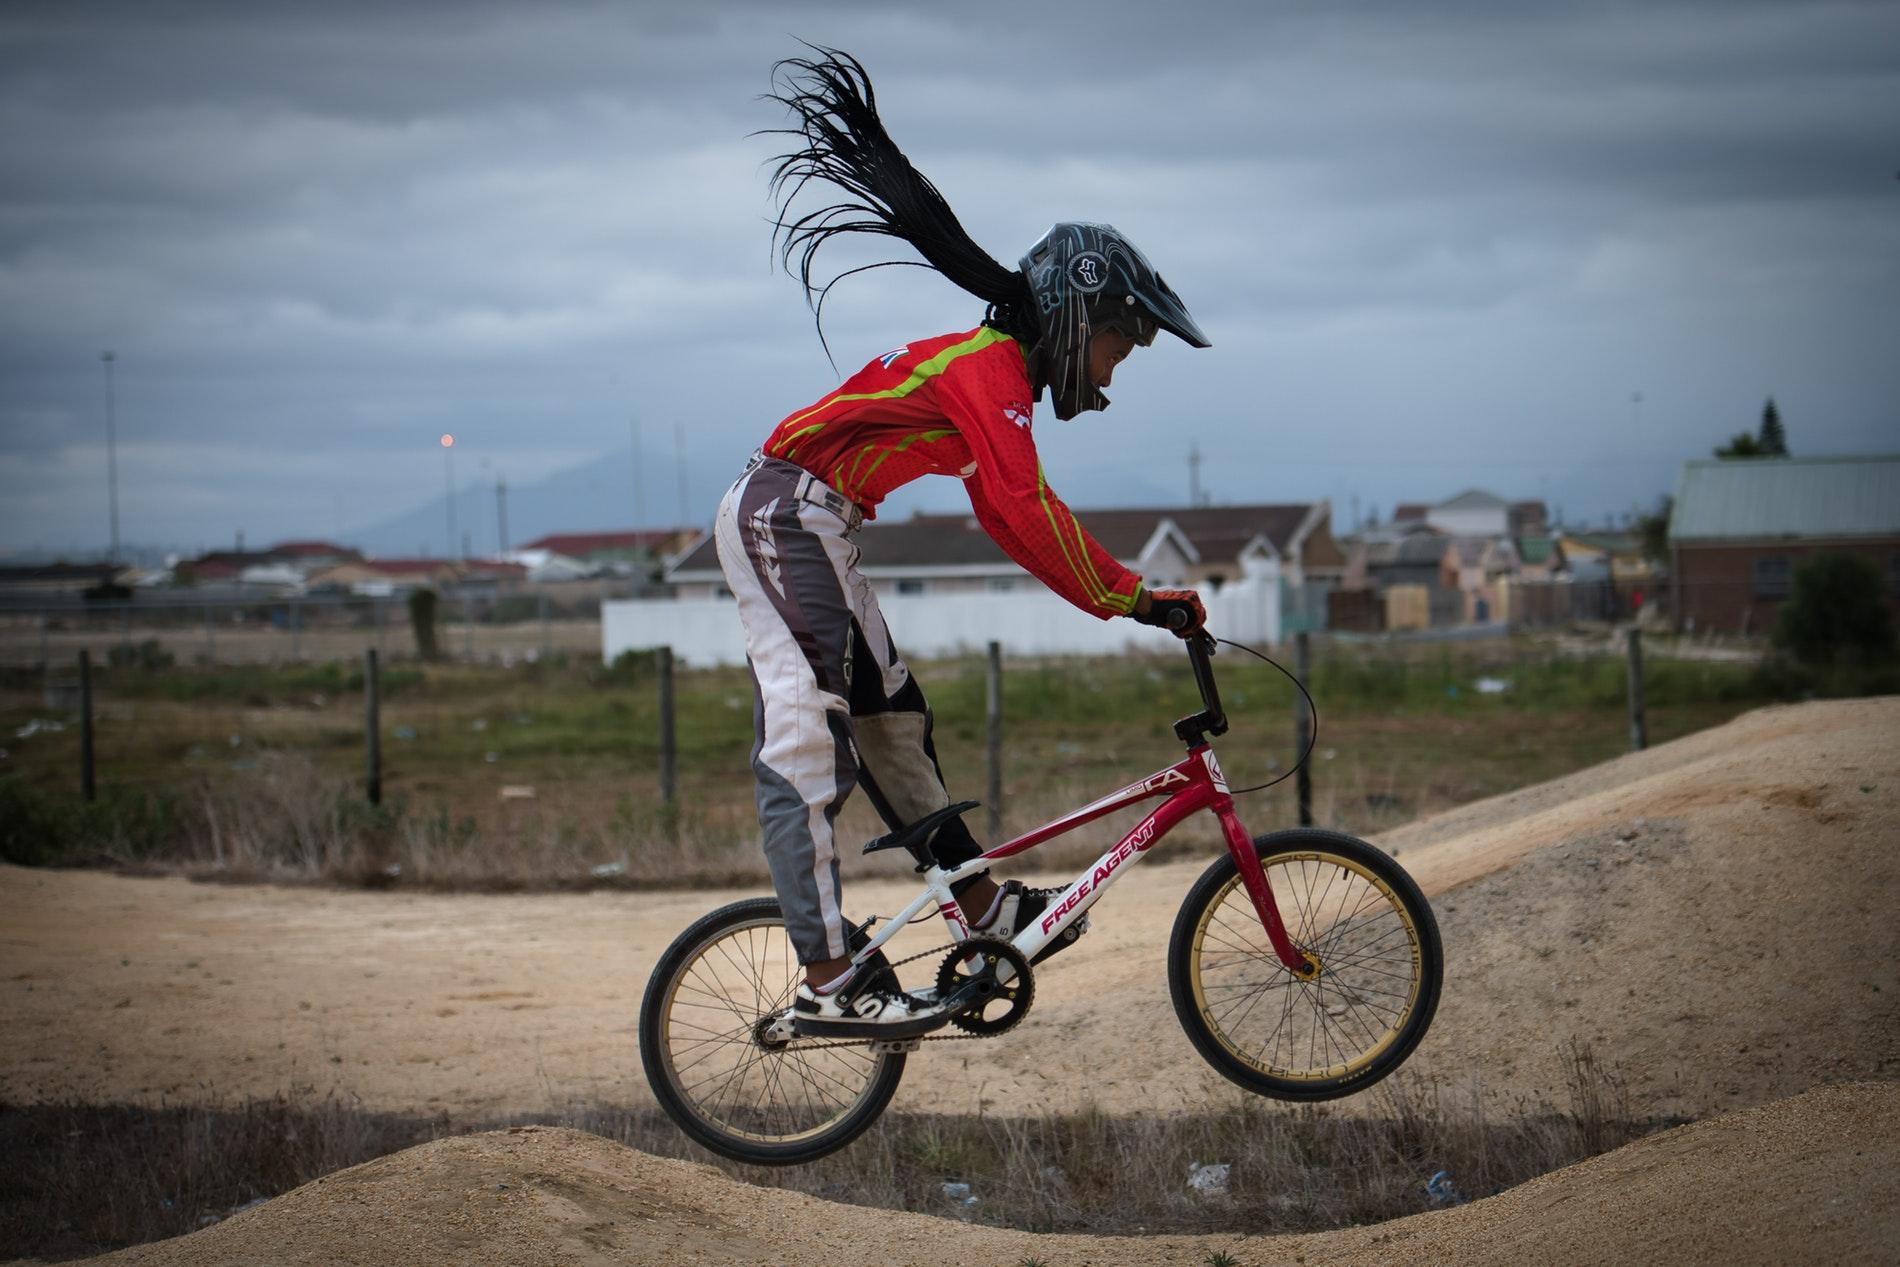 Anita Zenani on the dirt track.